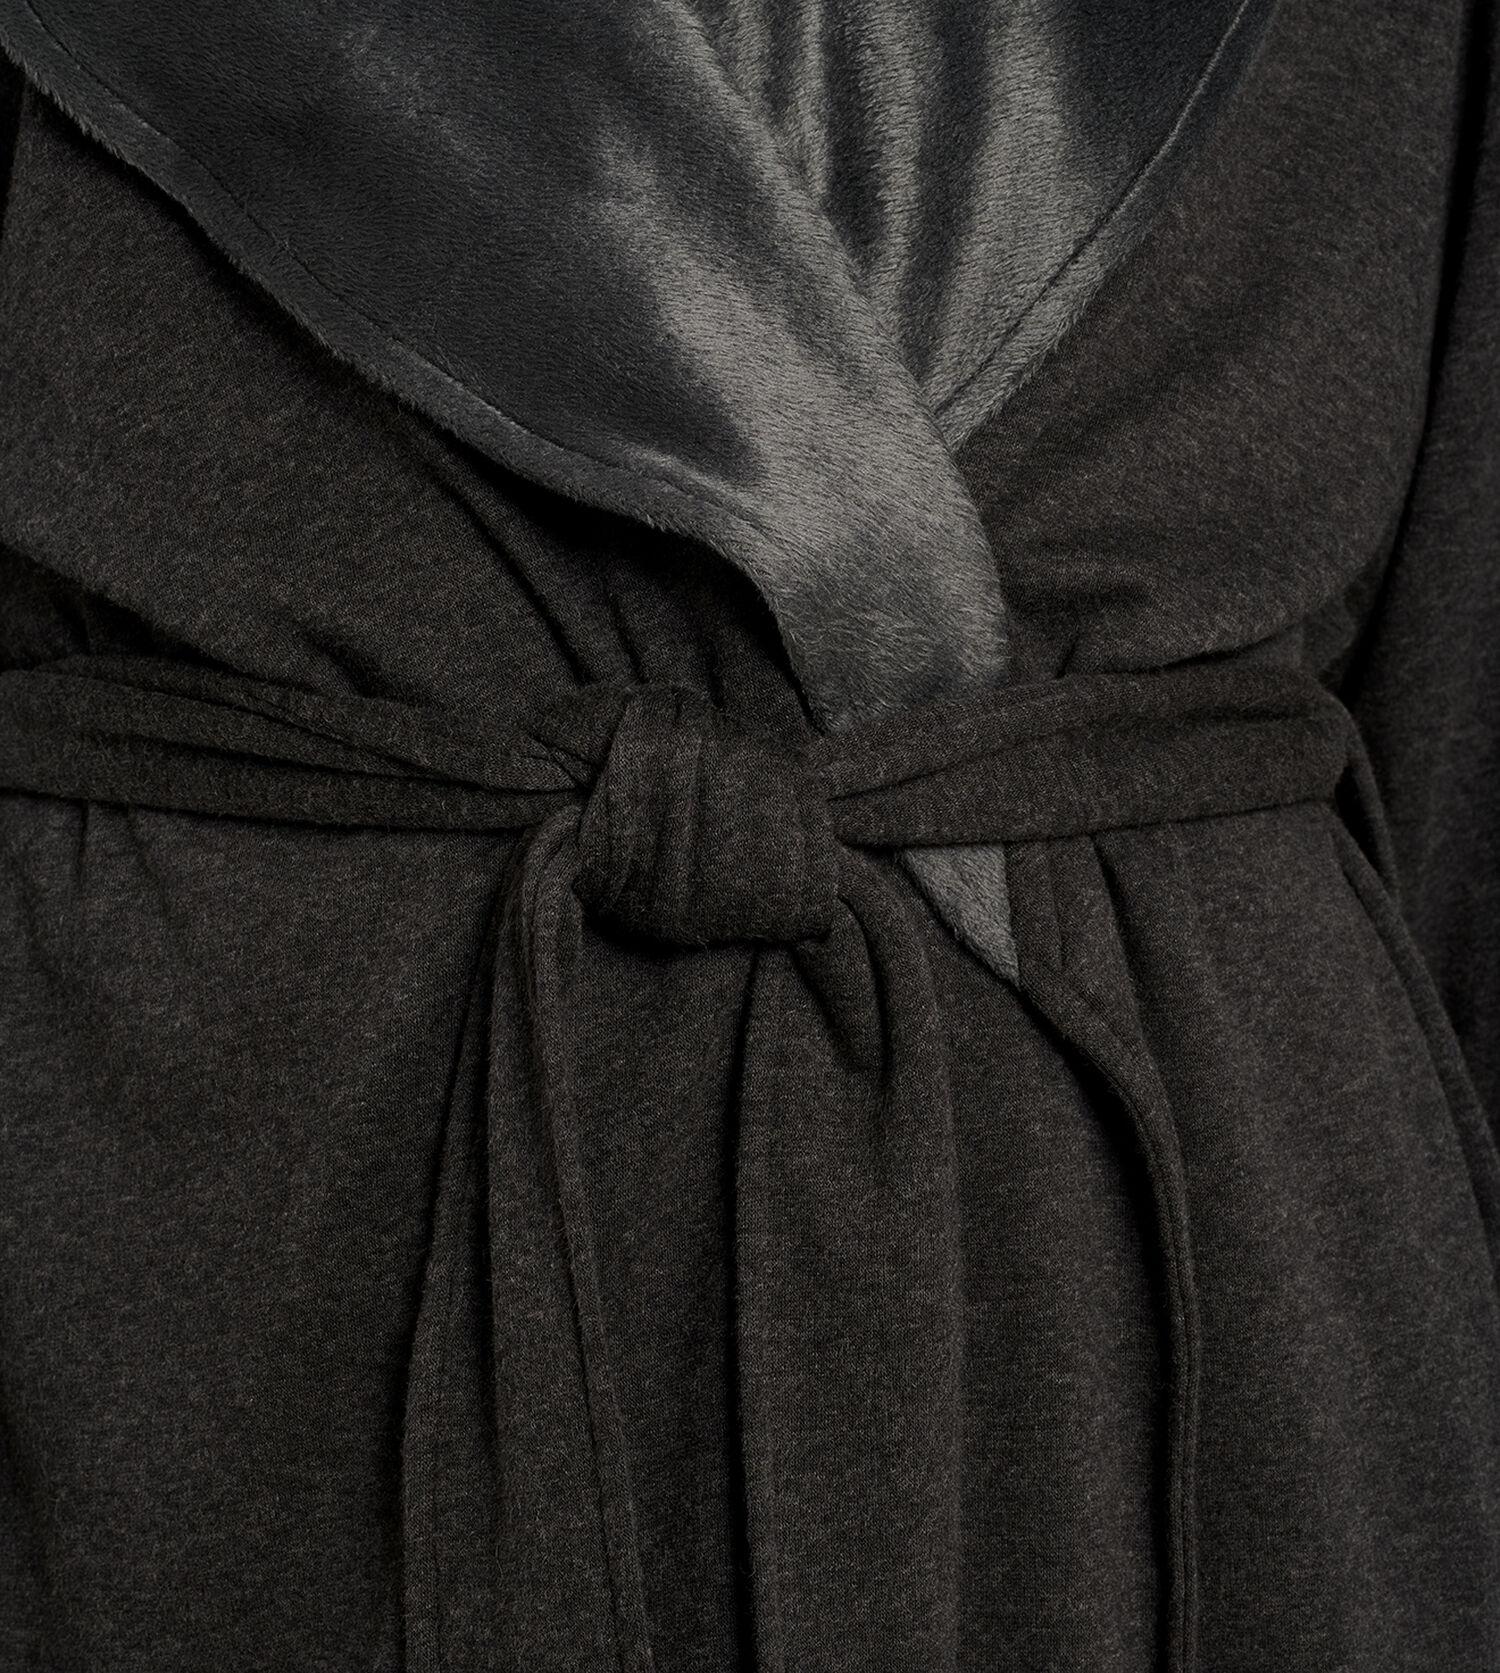 Zoom Duffield II Plus Robe - Image 2 of 5 b73108347